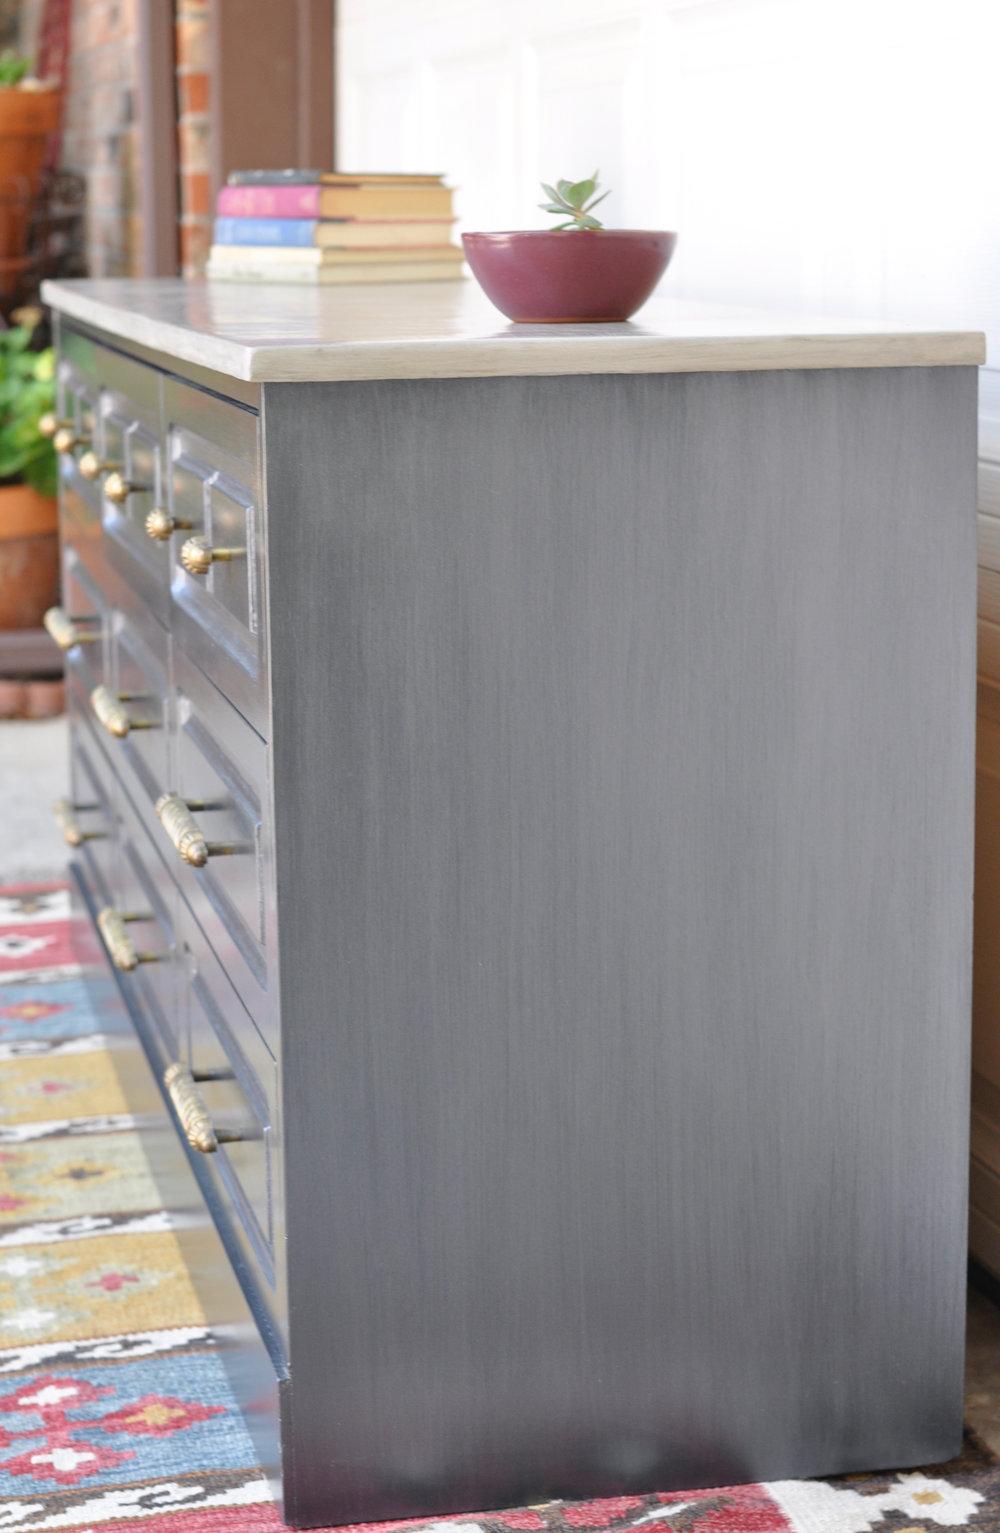 crimson + oak designs | concrete top gray dresser 009.JPG